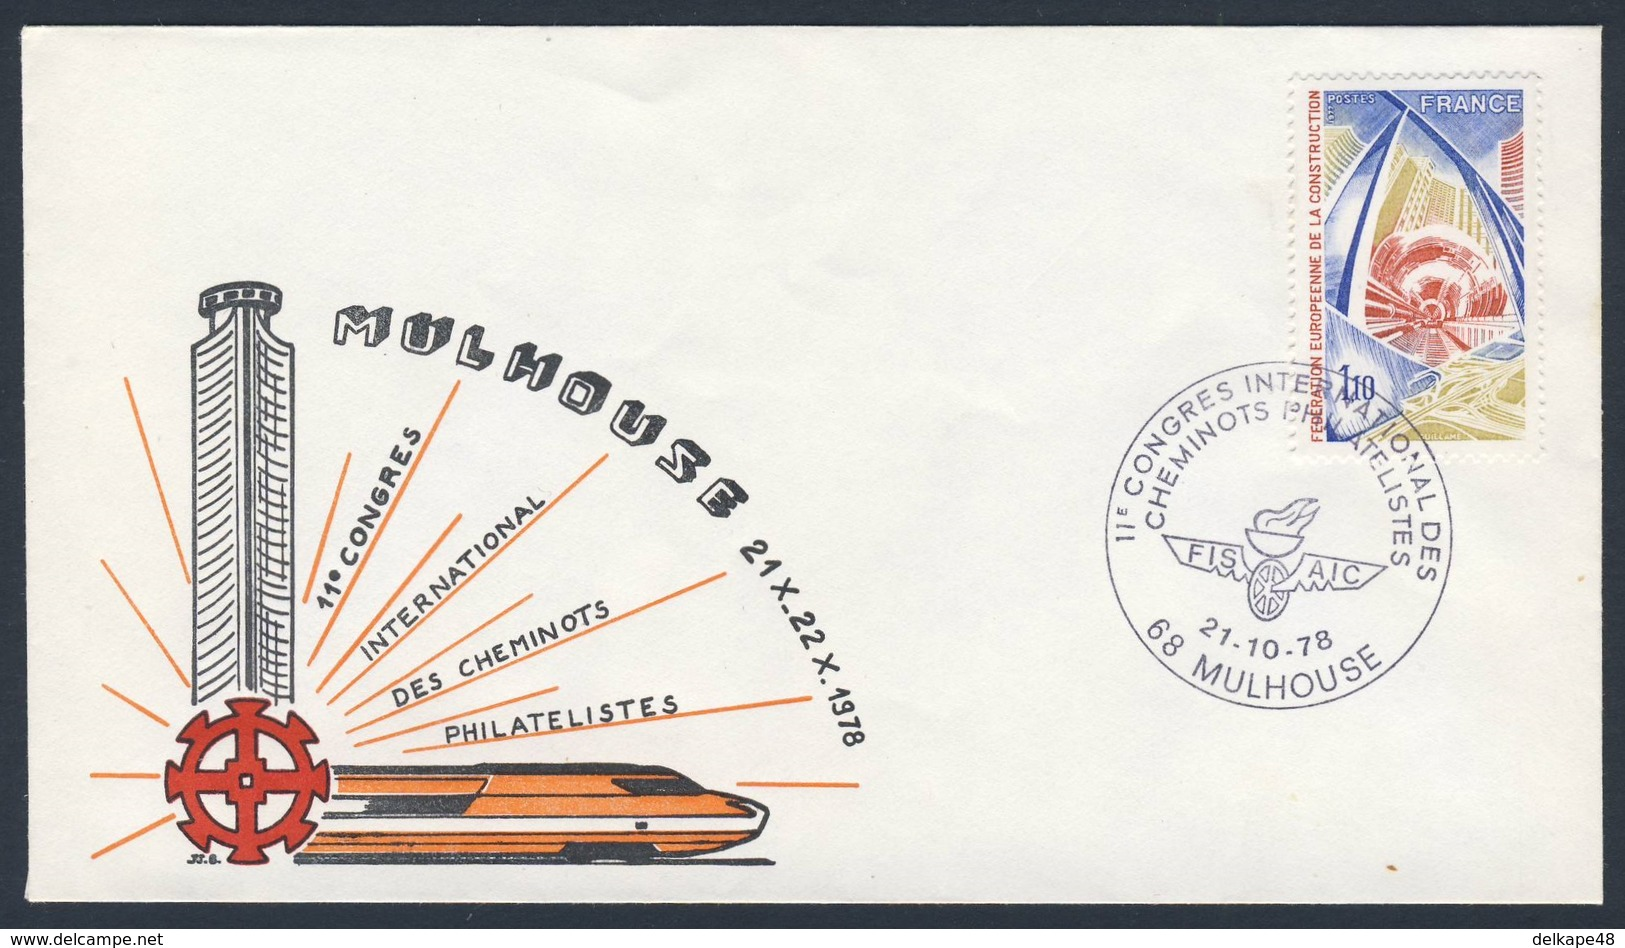 France Rep. Française 1978 Cover / Brief / Enveloppe - 11e Congres Int. Cheminots Philatelistes, Mulhouse - FISAIC - Treinen